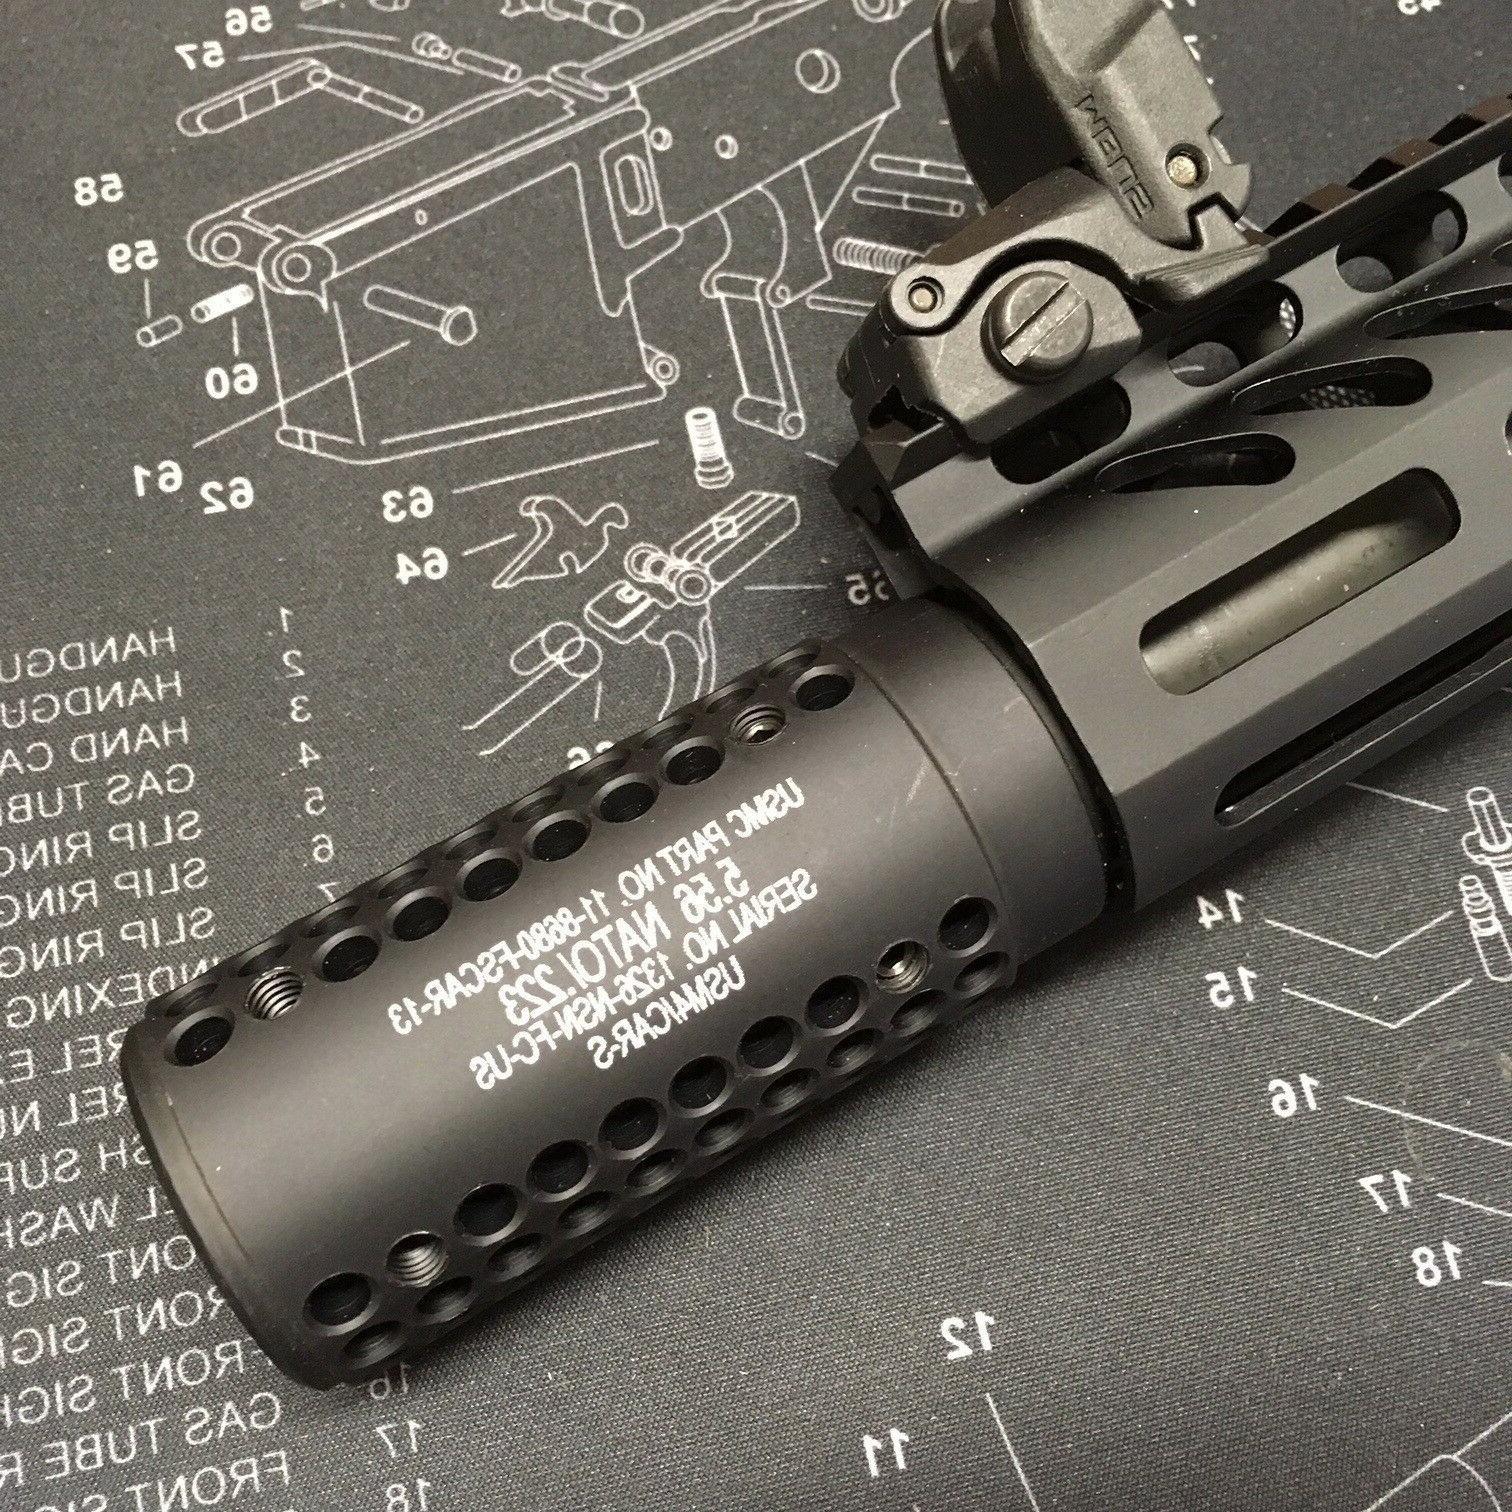 GUNTEC USA Mini SOCOM Slip-Over Barrel Shroud Muzzle Brake 2